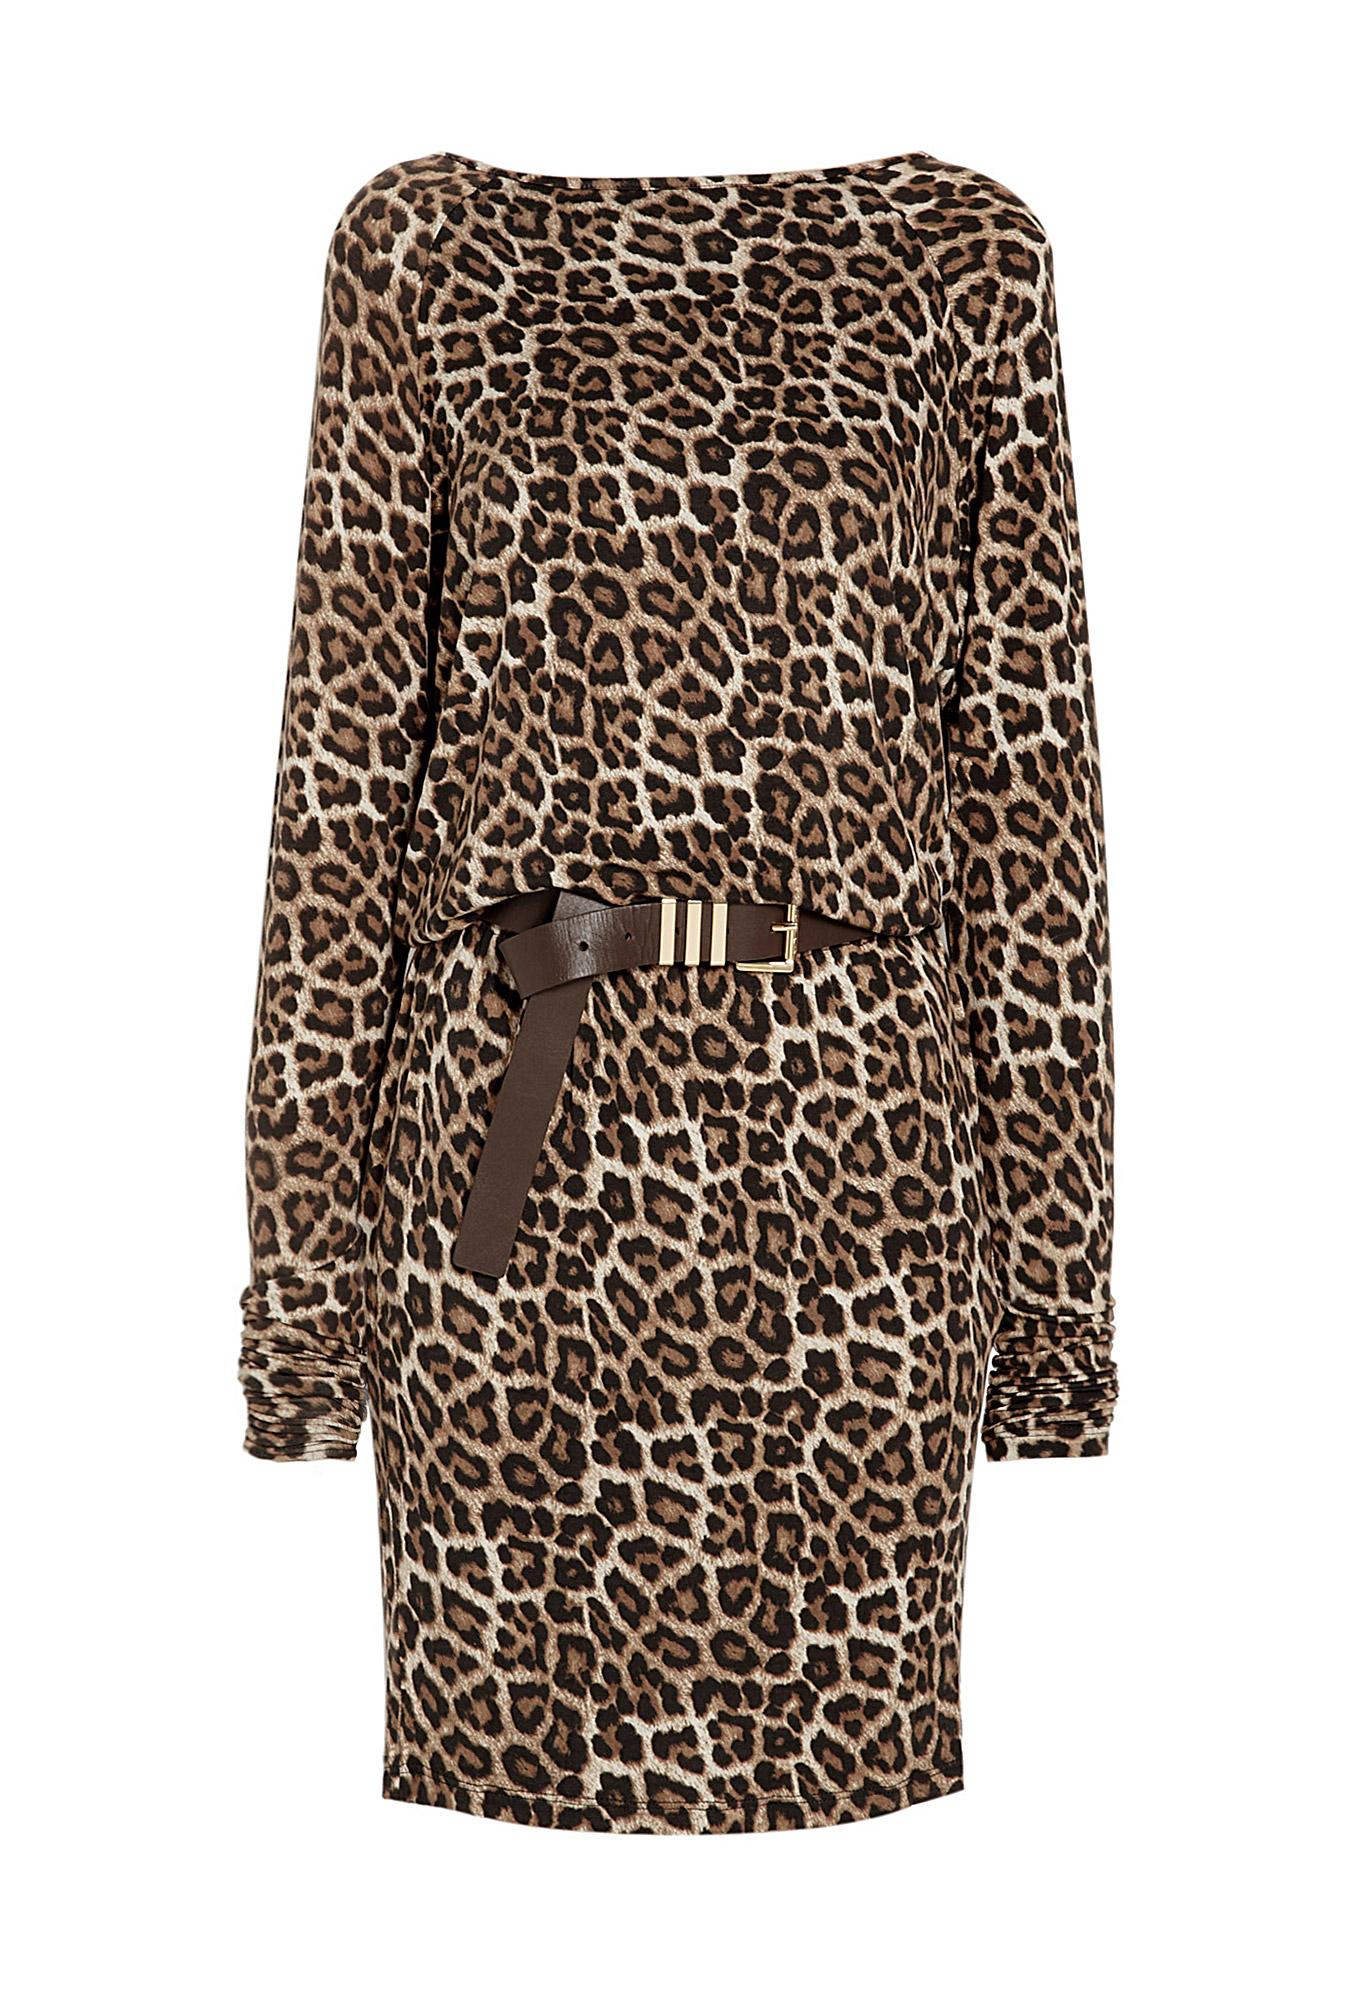 Michael Michael Kors Belted Raglan Animal Print Dress In